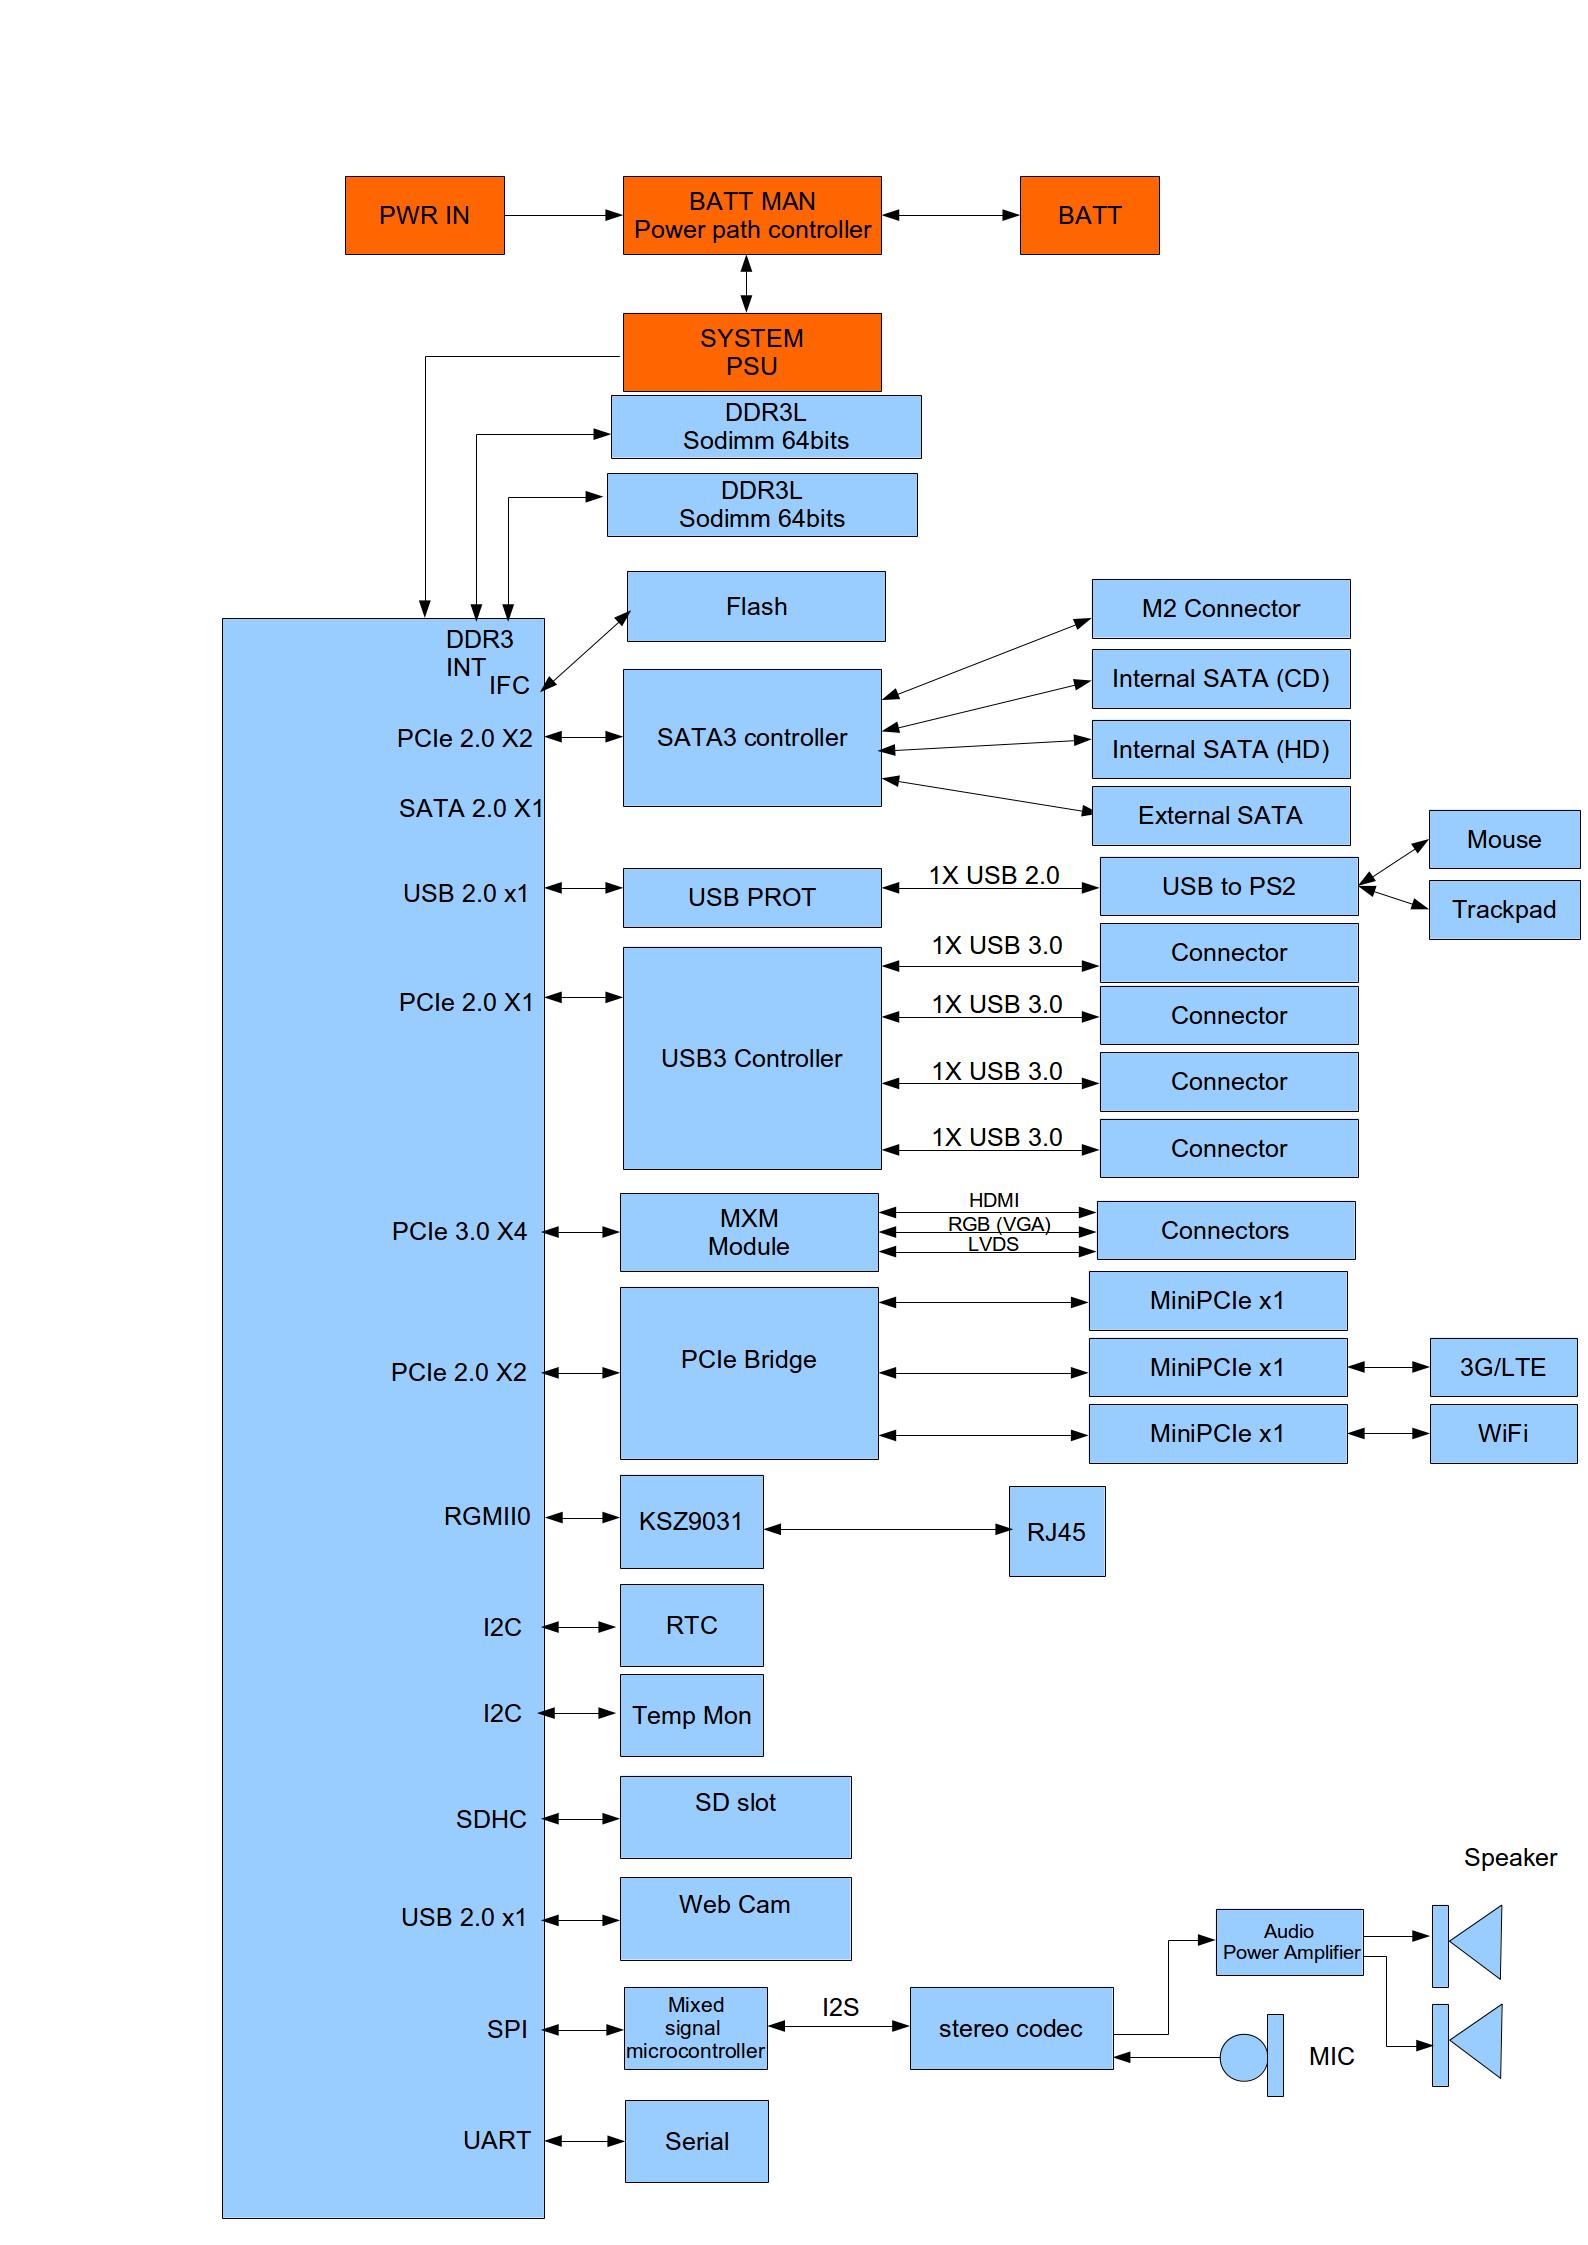 Powerpc notebook block diagram done gnulinux powerpc notebook powerpc notebook block diagram done gnulinux powerpc notebook ccuart Images